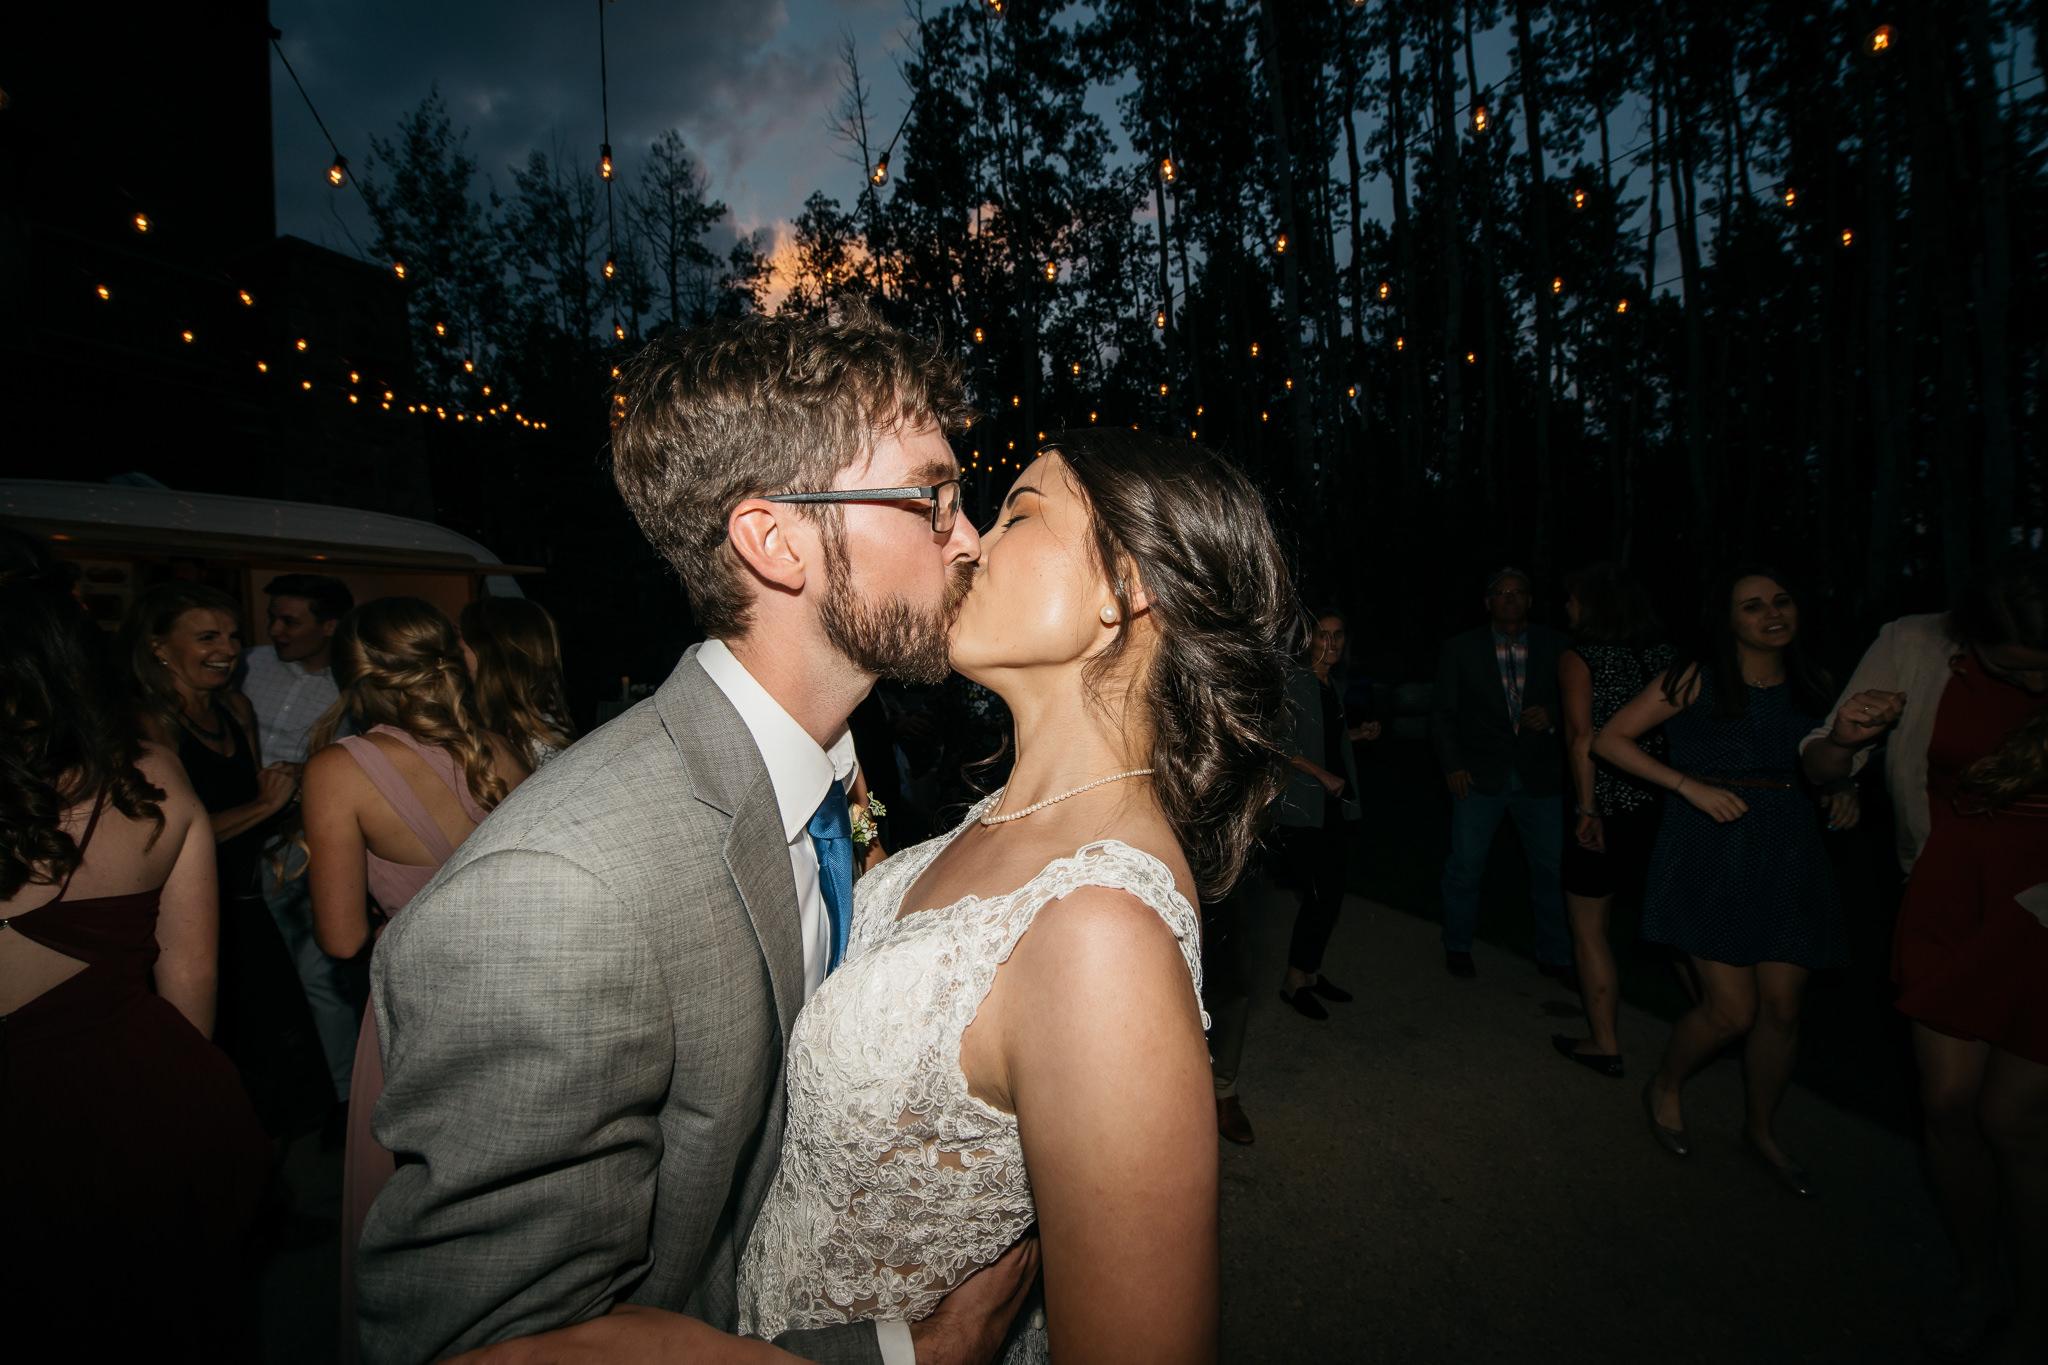 701_ONL_Kat_Nick_Wedding_Trevor_Hooper_Photo.jpg